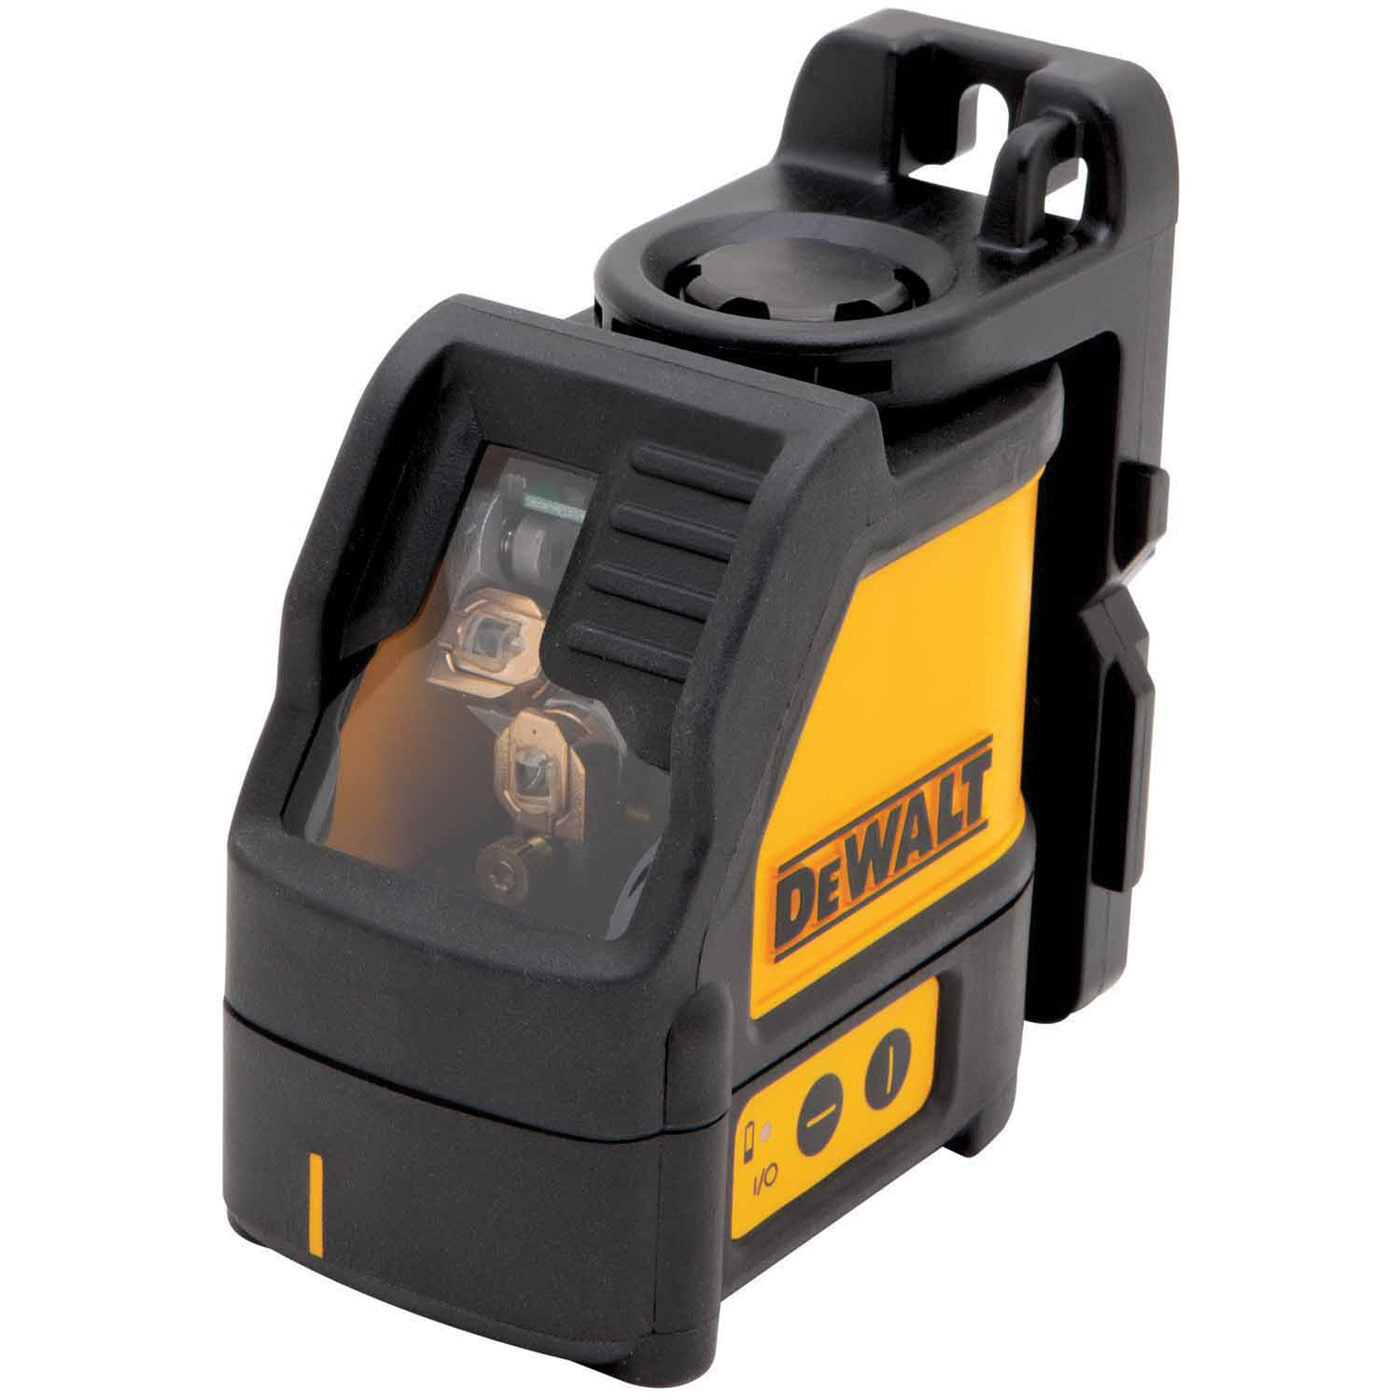 DeWALT® DW088K Self-Leveling Line Laser -  +/-0.3 mm/m -  +/-4 deg Auto Leveling -  2 Beams -  4.5V - 3x AA Power Source